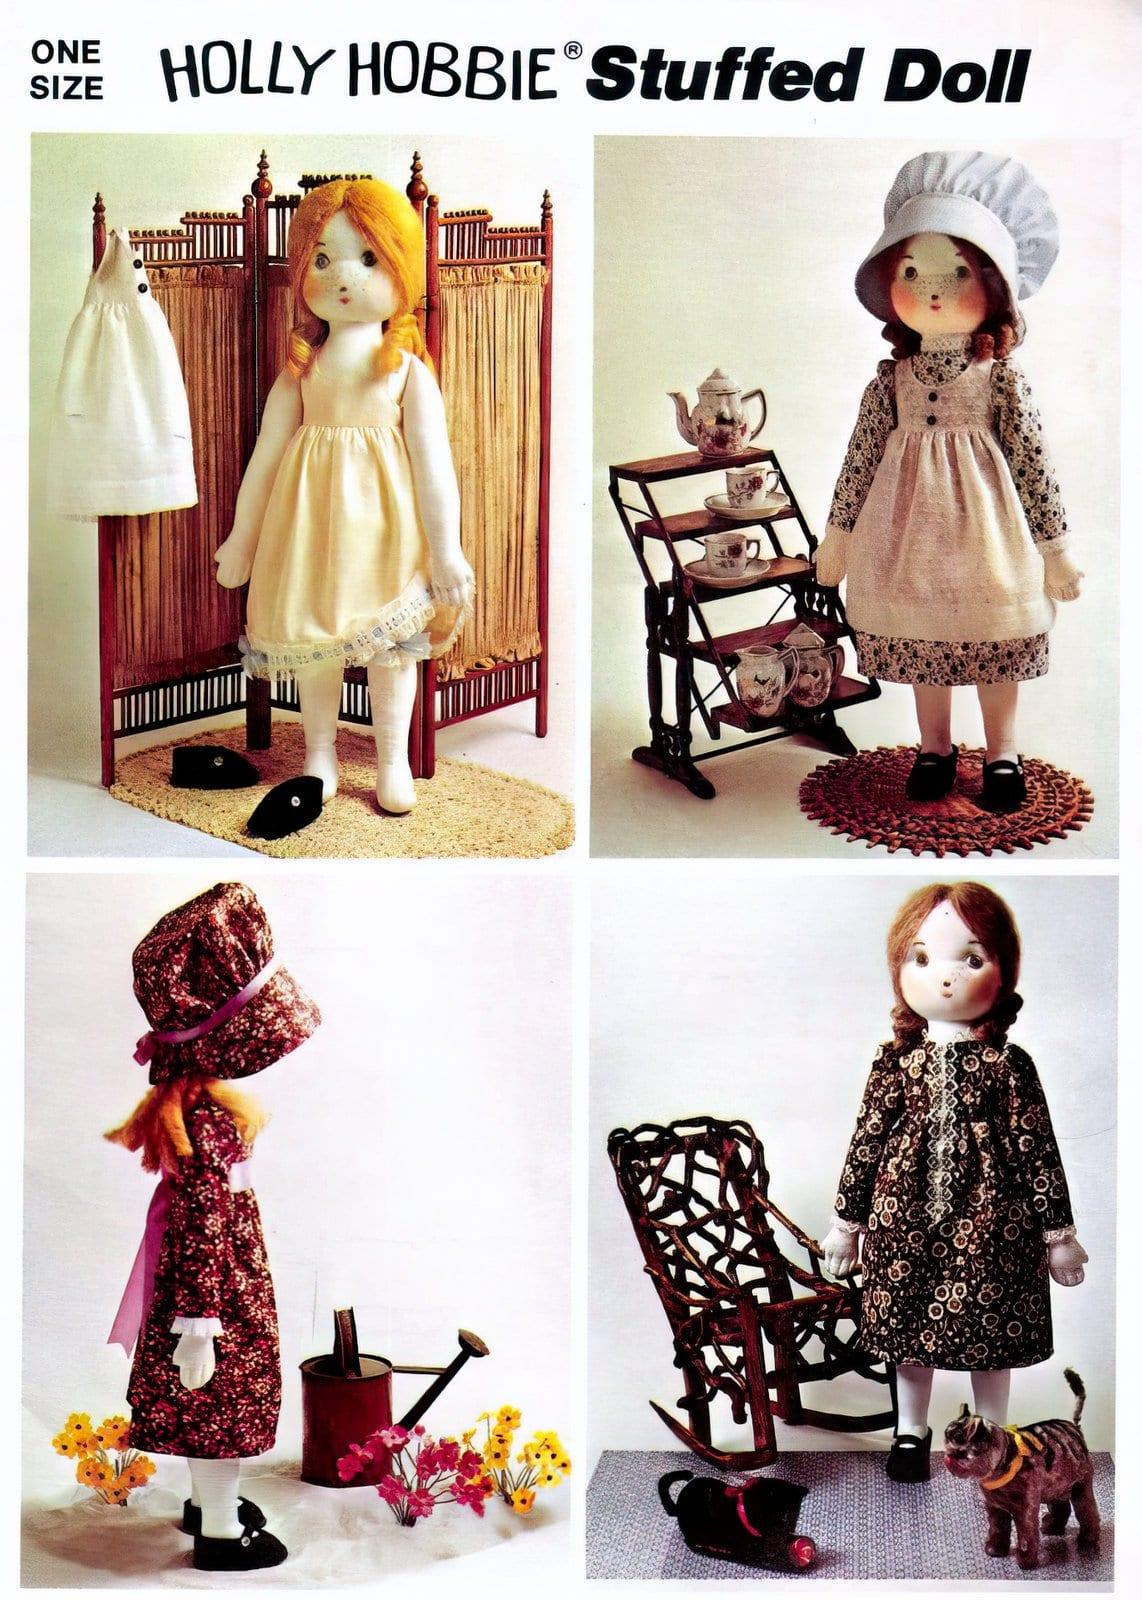 Holly Hobbie stuffed doll Simplicity pattern 1973